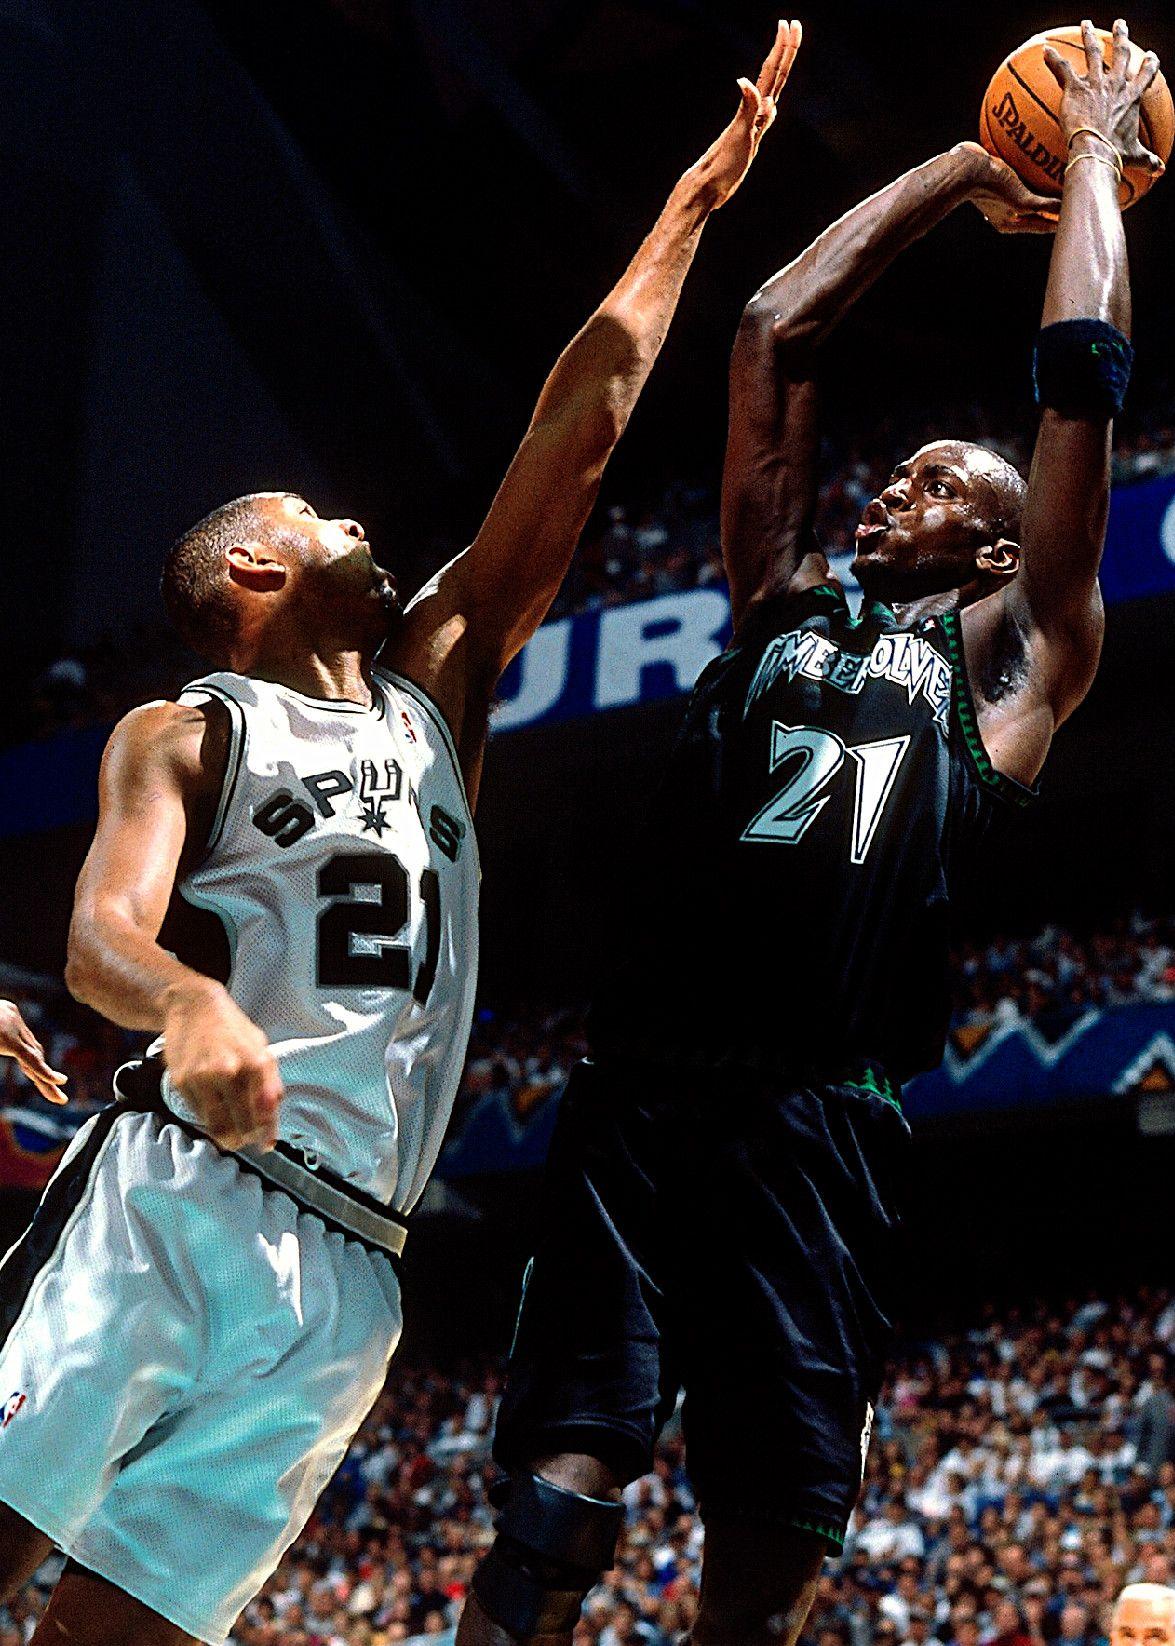 Kevin Garnett shoots over Tim Duncan www.kingsofsports.com